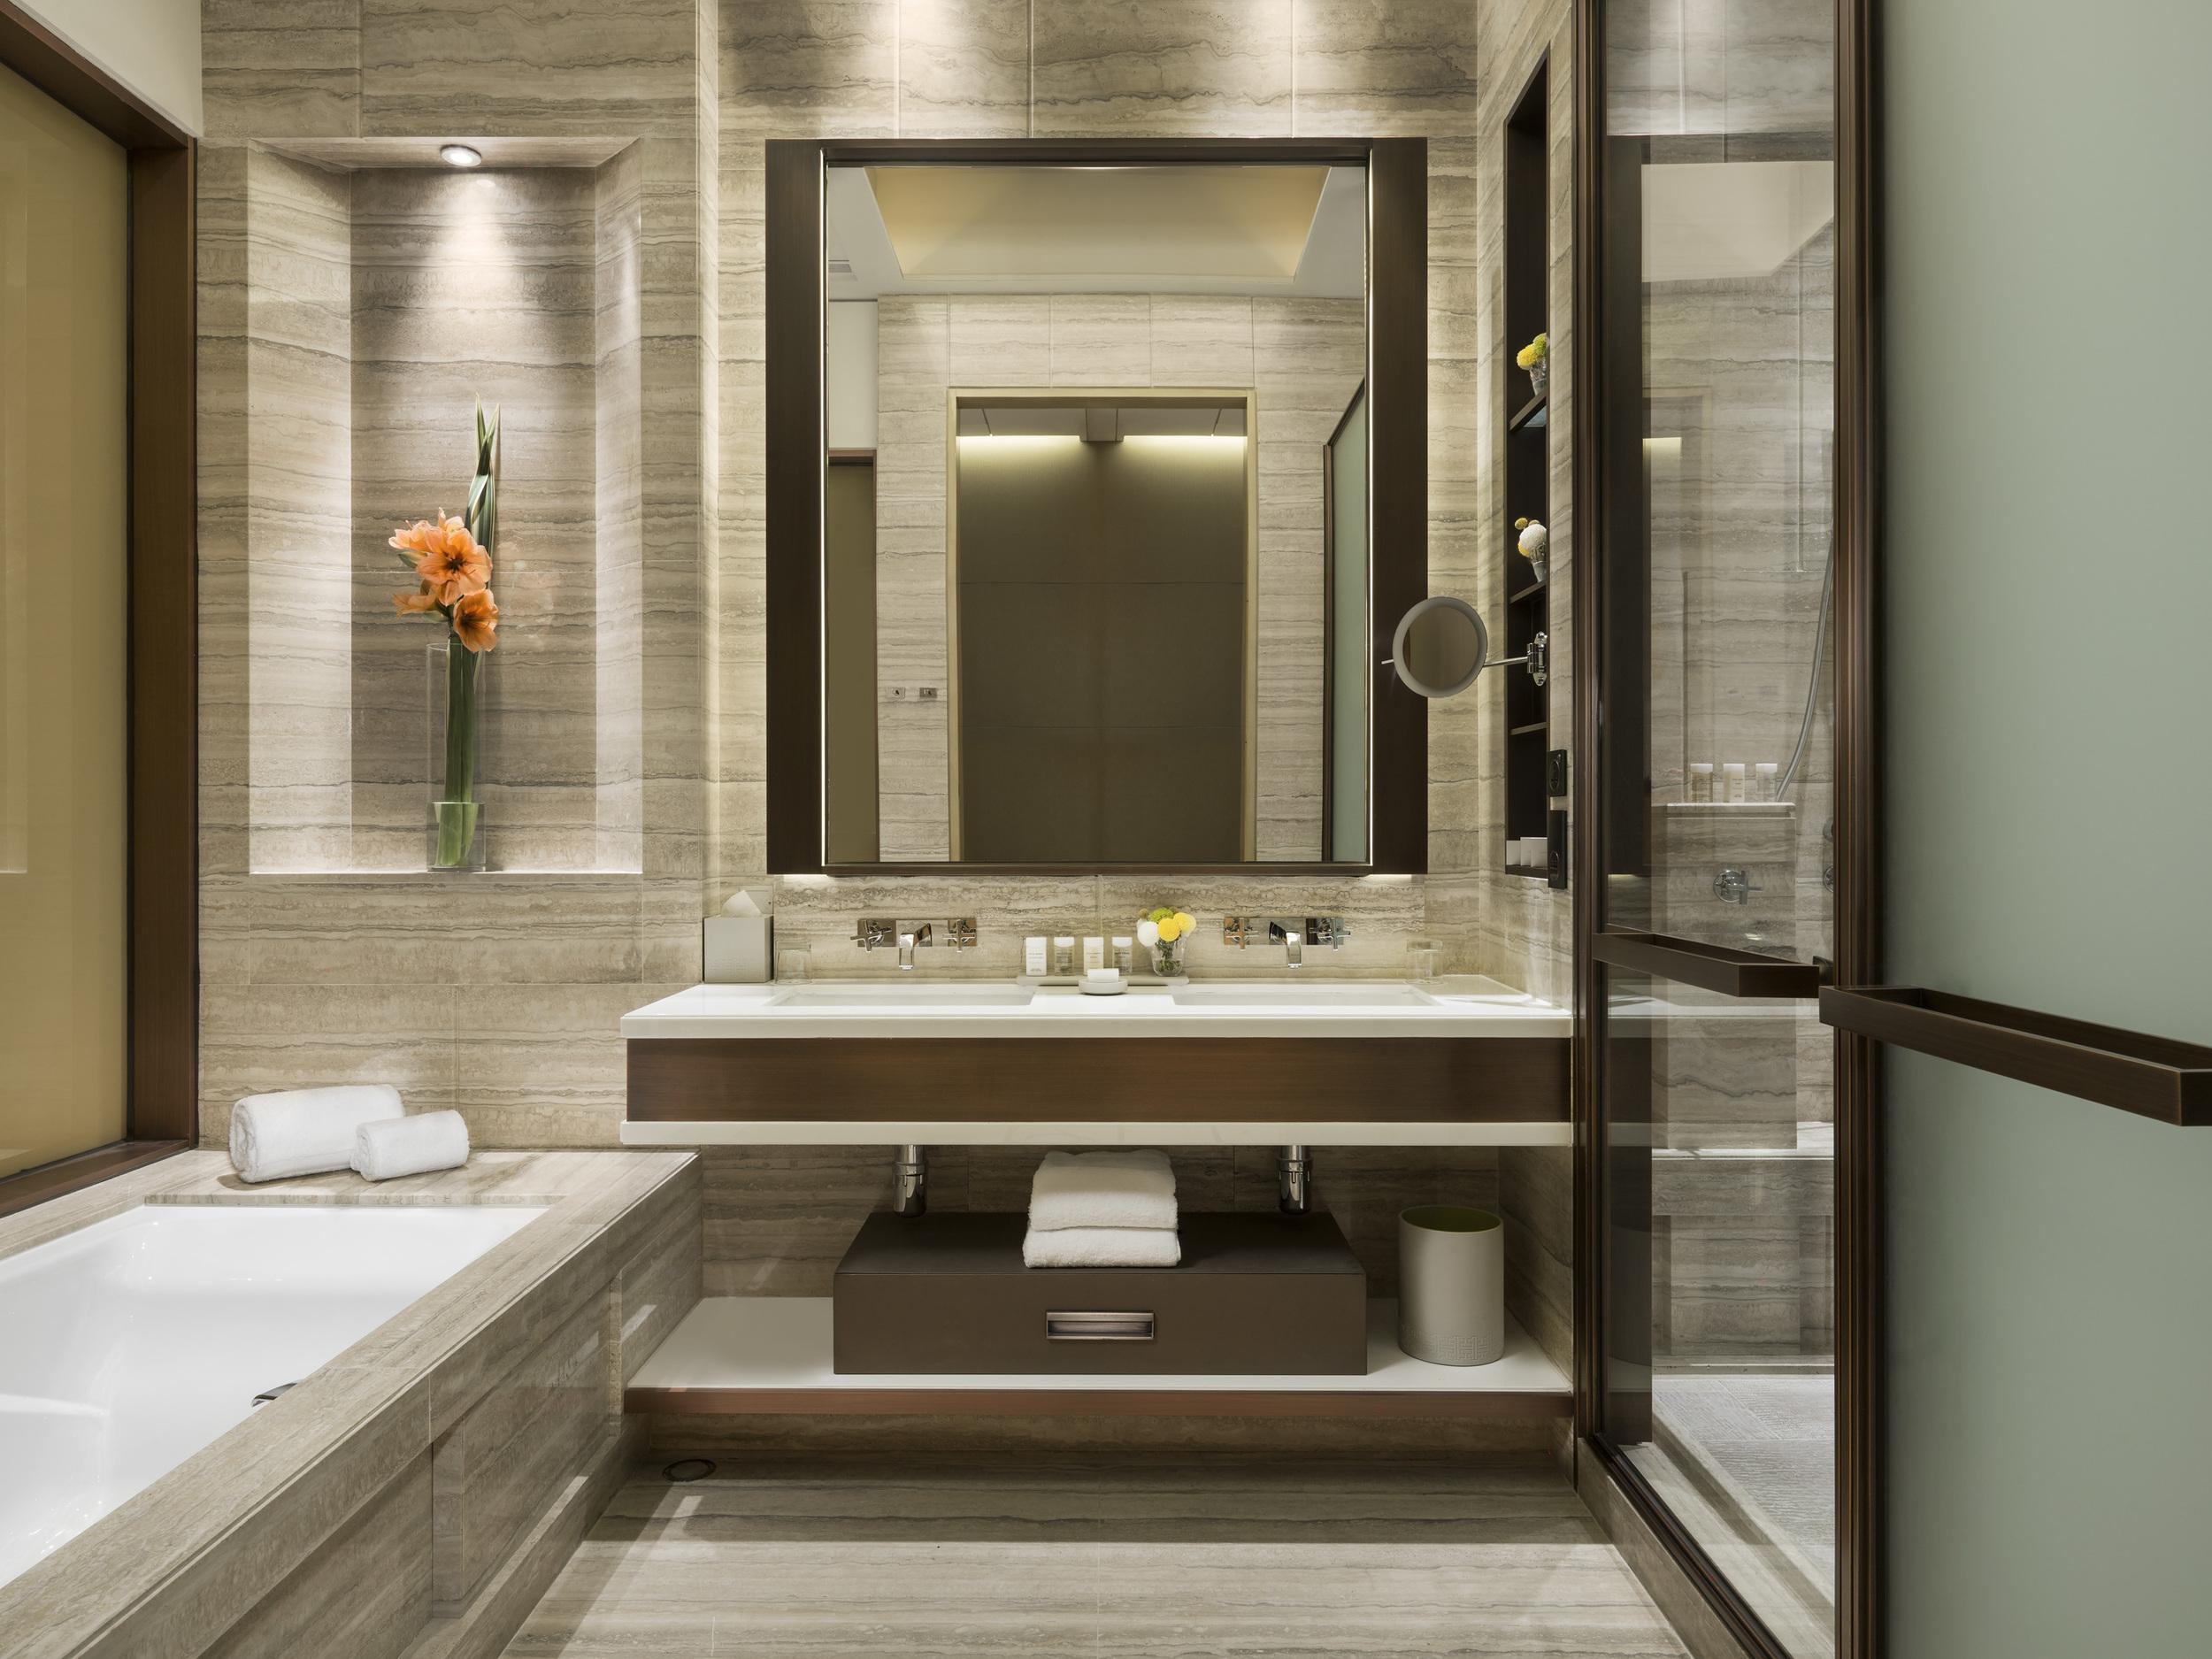 OHK_Deluxe Olympian Room bathroom.jpg